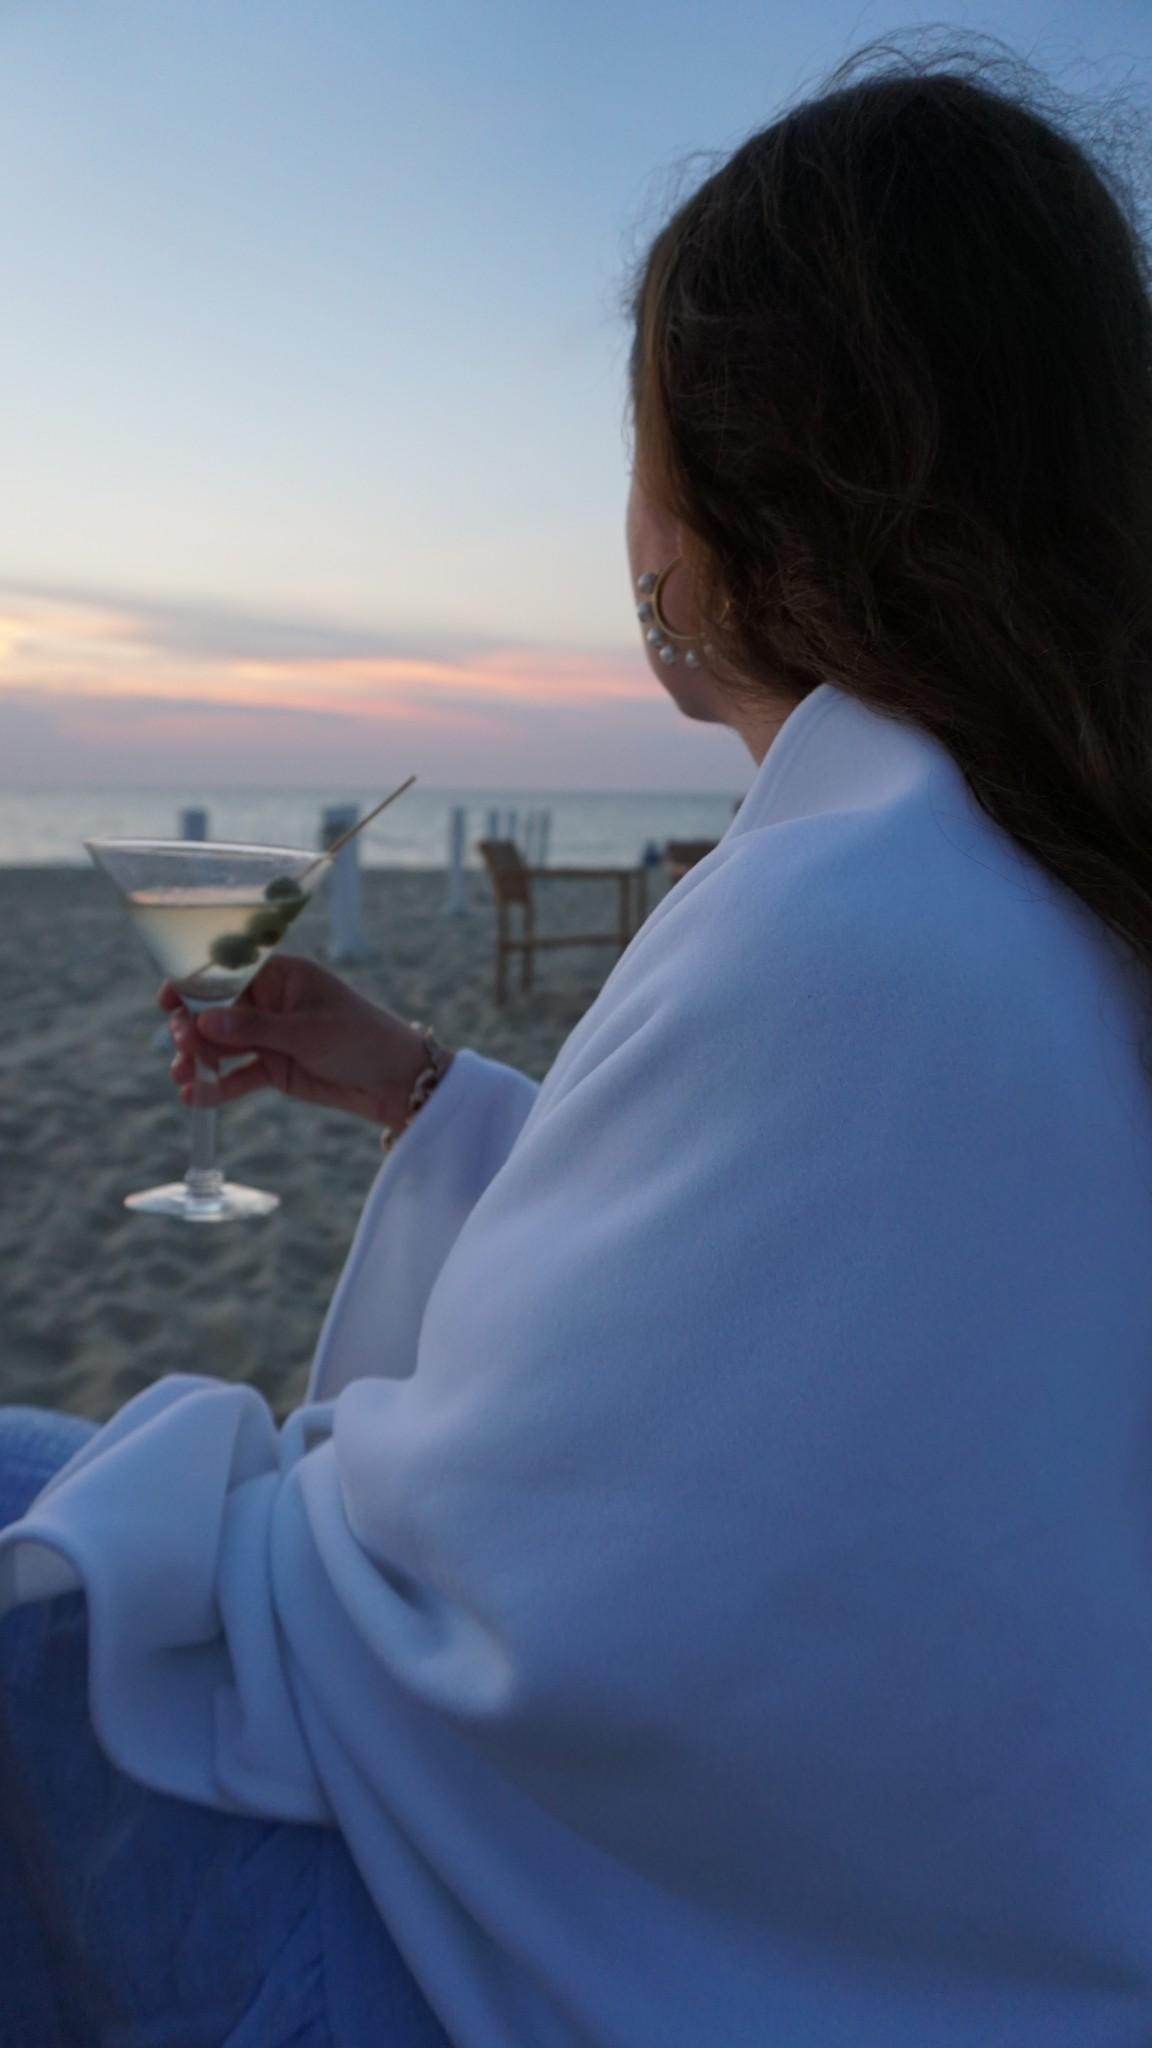 DUDLEY STEPHENS, sunset galley beach, nantucket, the-alyst.com